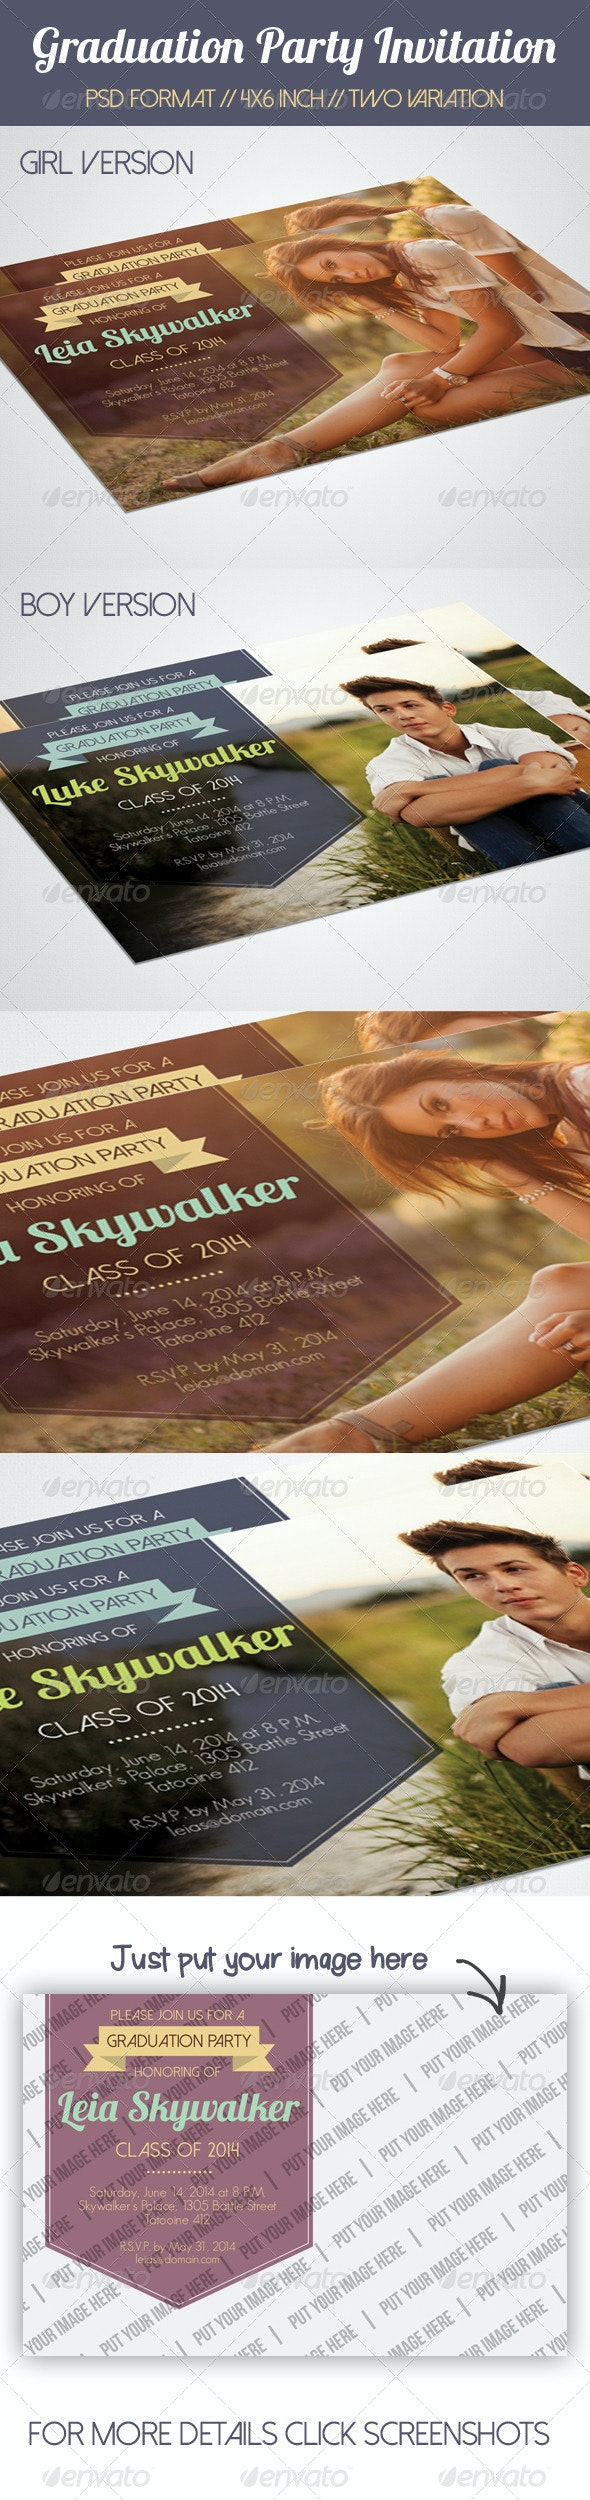 Simple Graduation Party Invitation - Invitations Cards & Invites